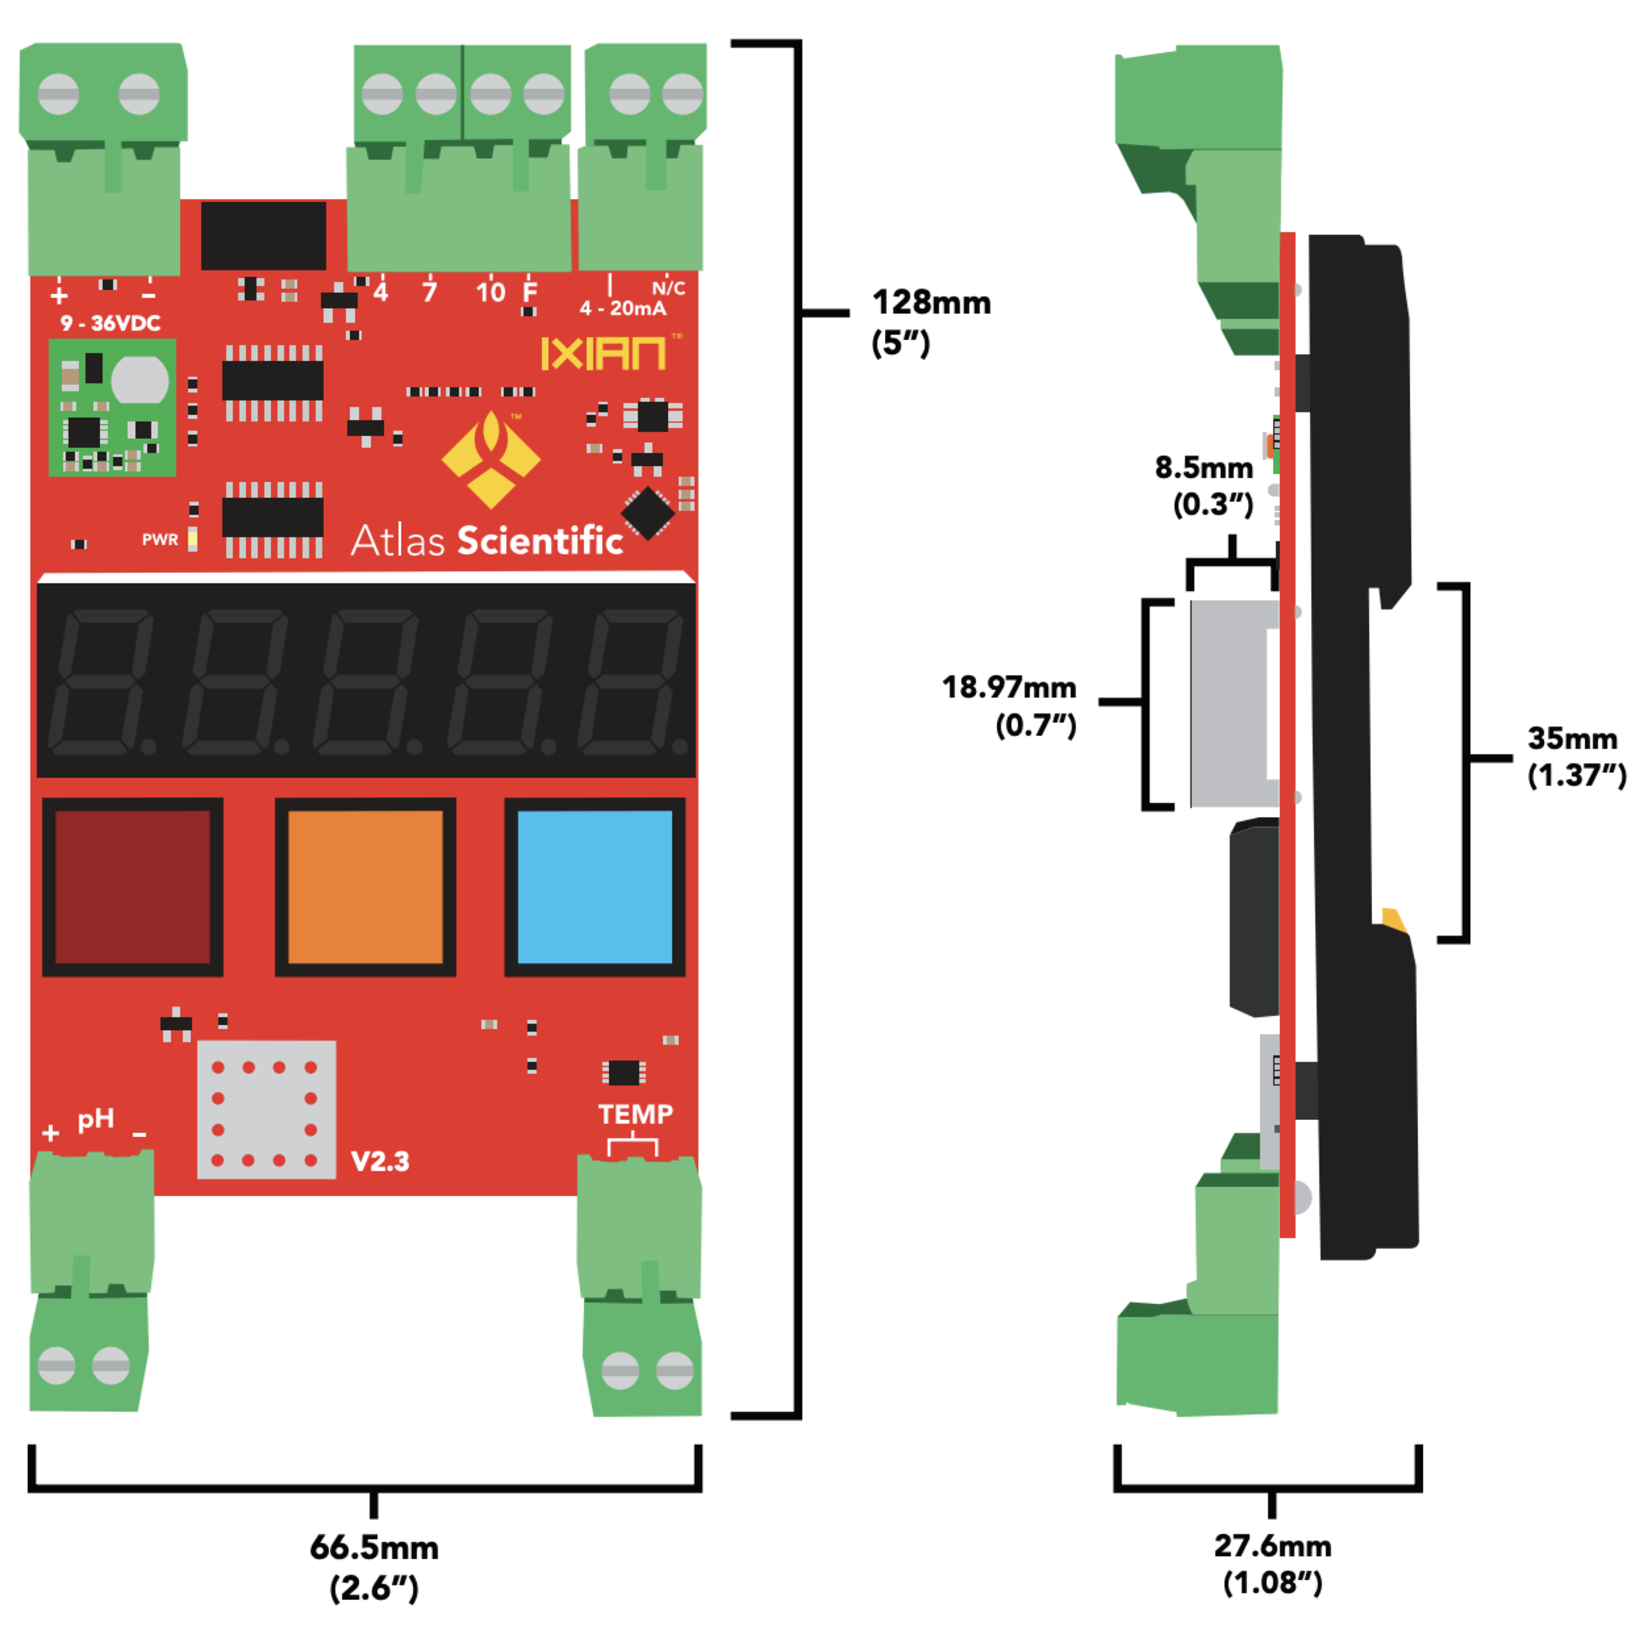 Atlas Scientific Ezo IXIAN™ pH Transmitter